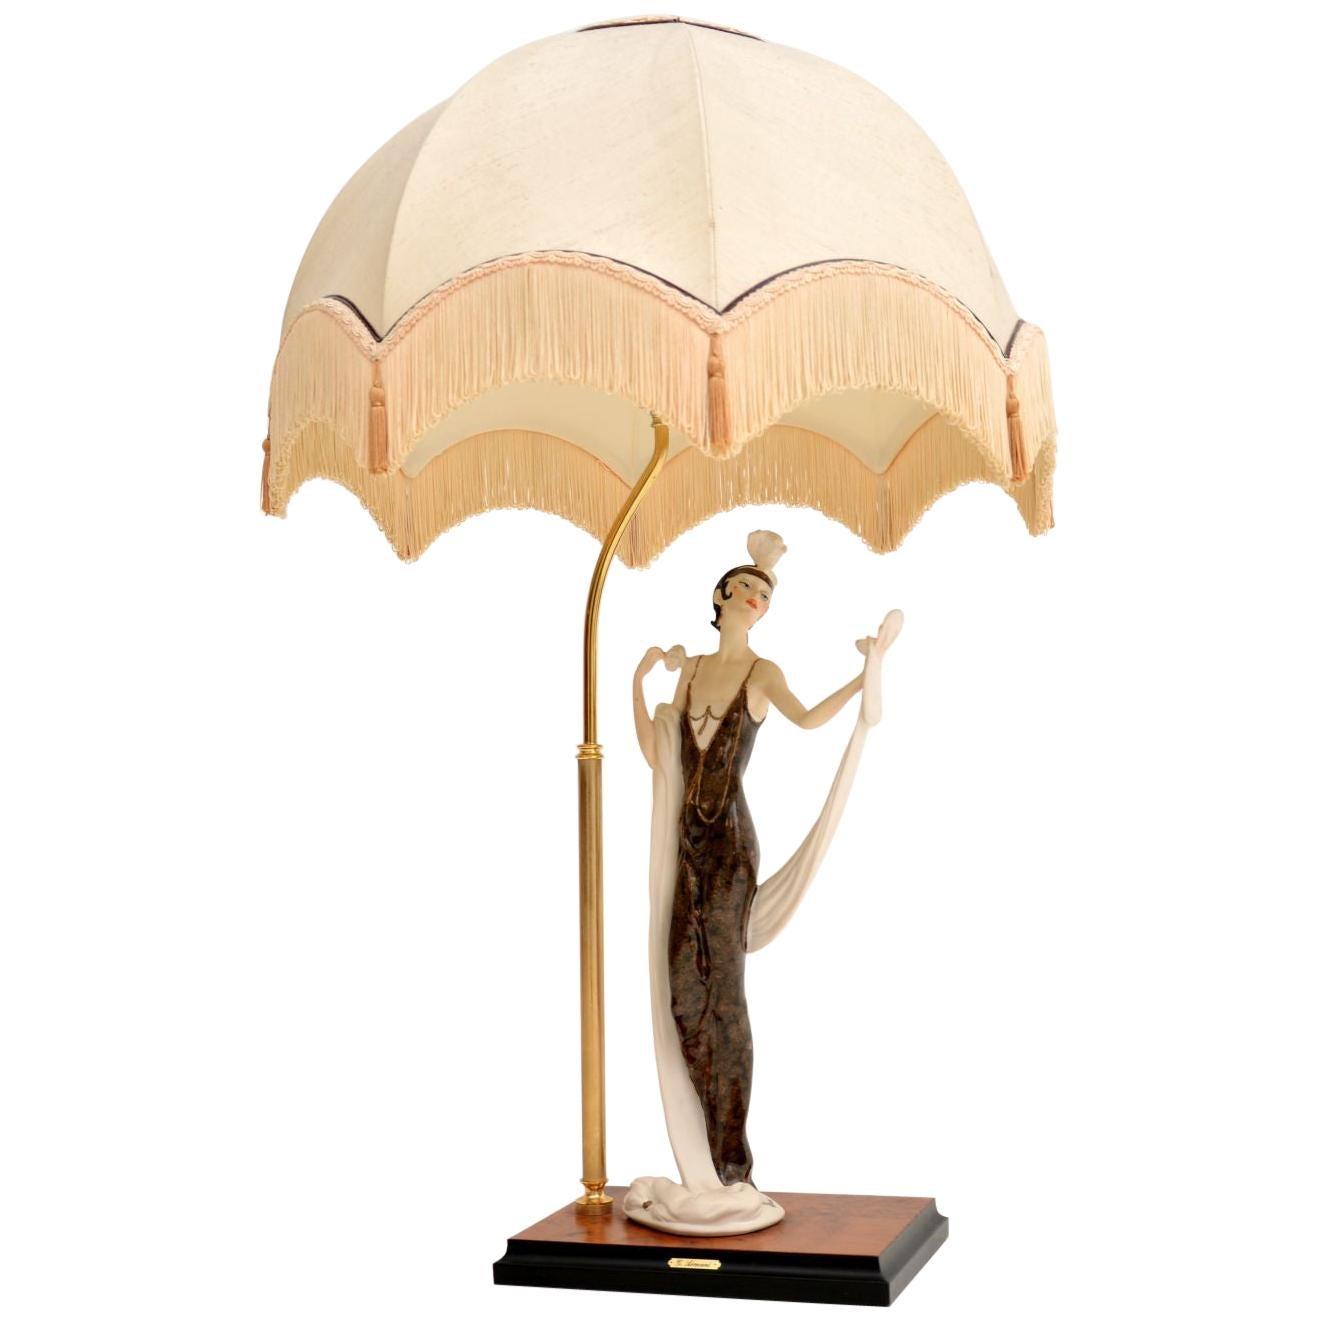 Vintage Italian Capodimonte Table Lamp by Giuseppe Armani